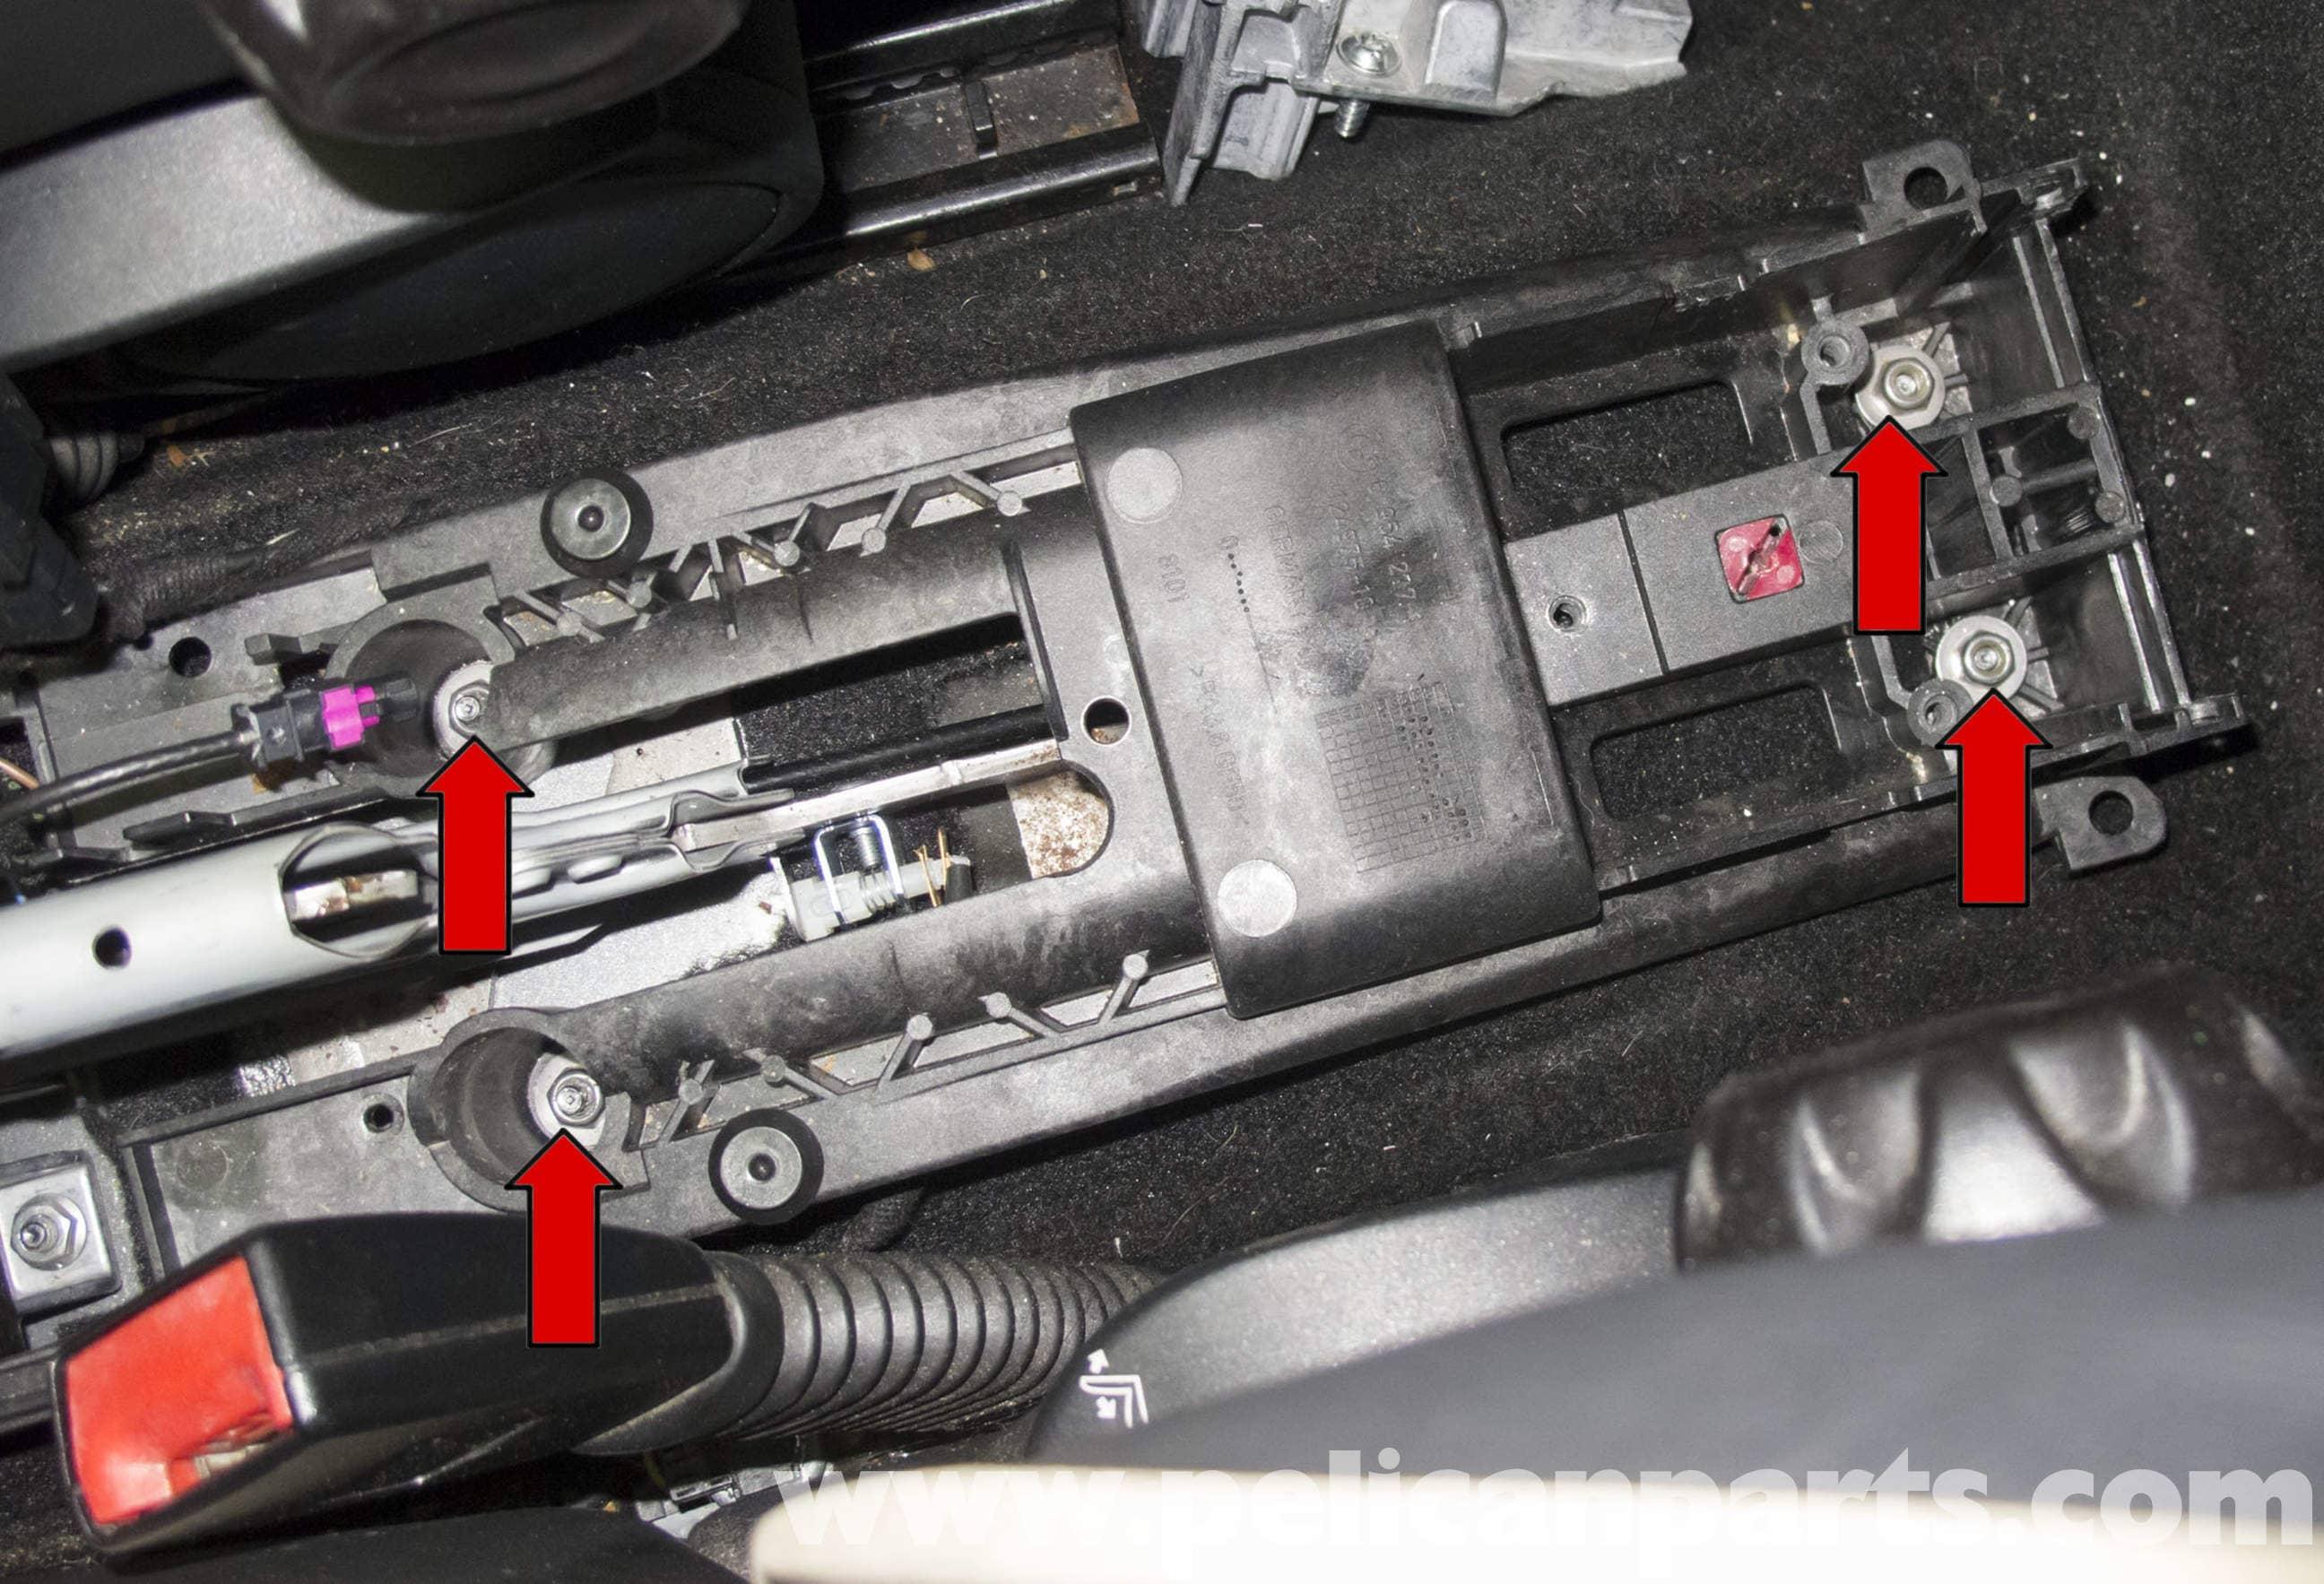 pic05 R Wiring Harness on best street rod, fuel pump, hot rod, fog light, universal painless,